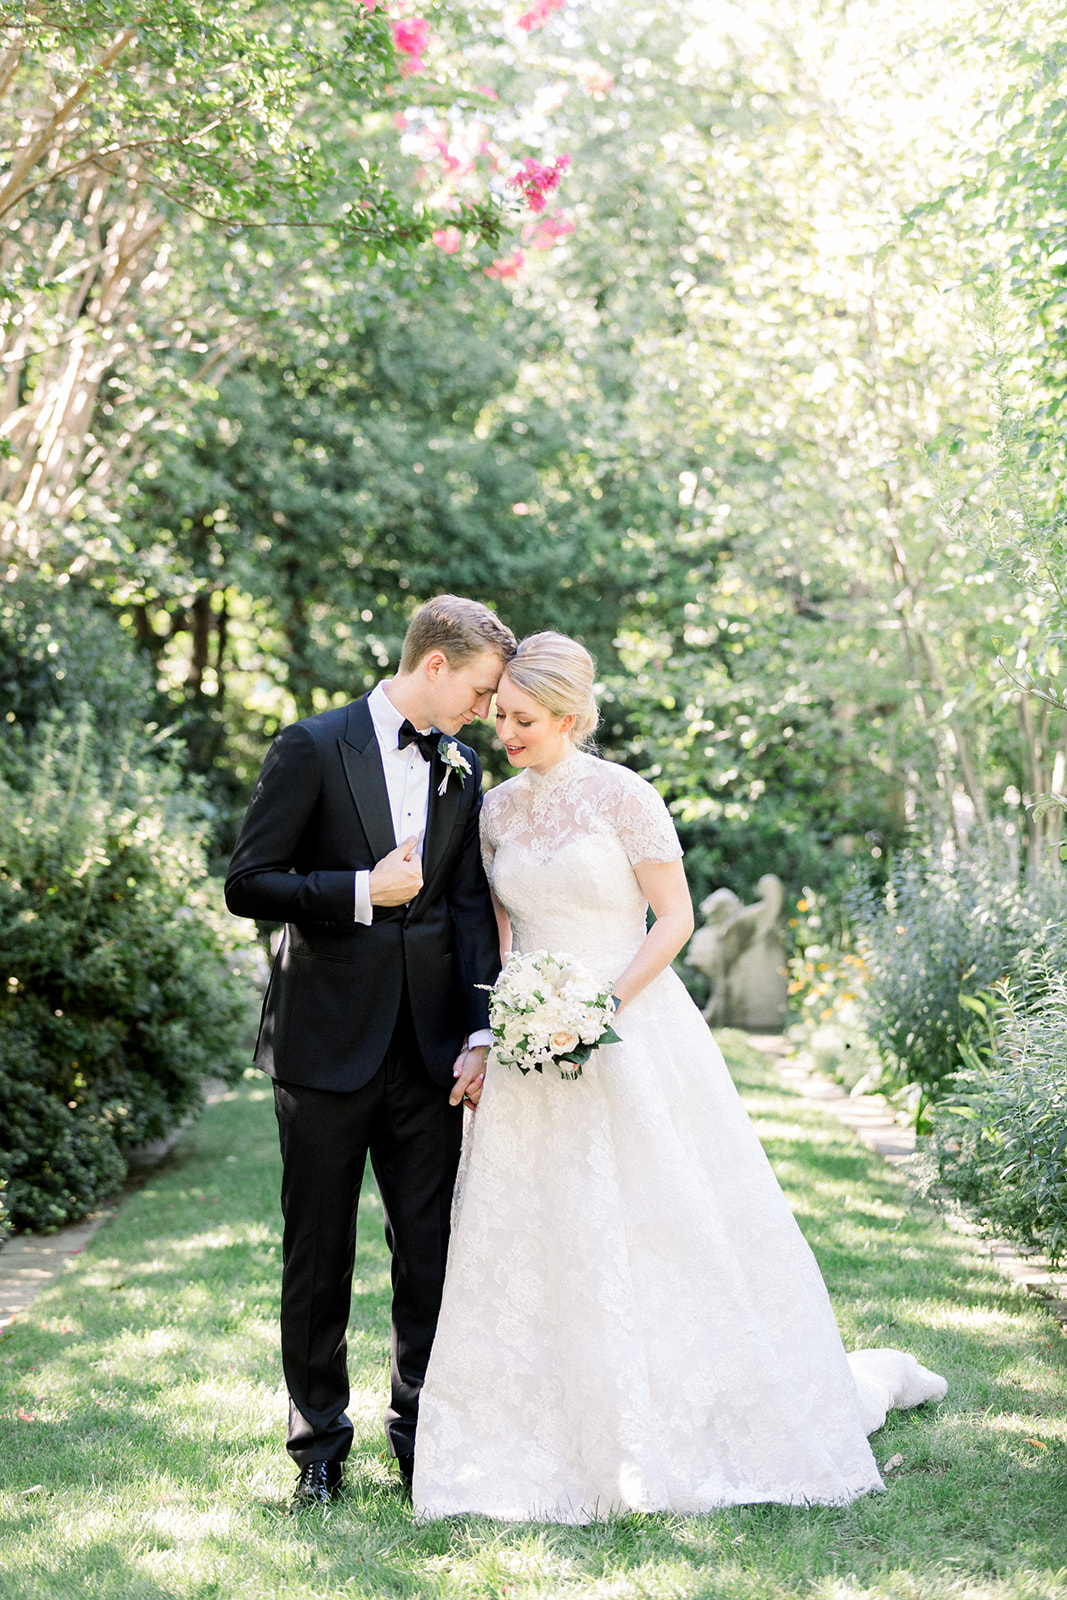 Overland Park Arboretum Wedding   Cara + Andy   Hey Tay